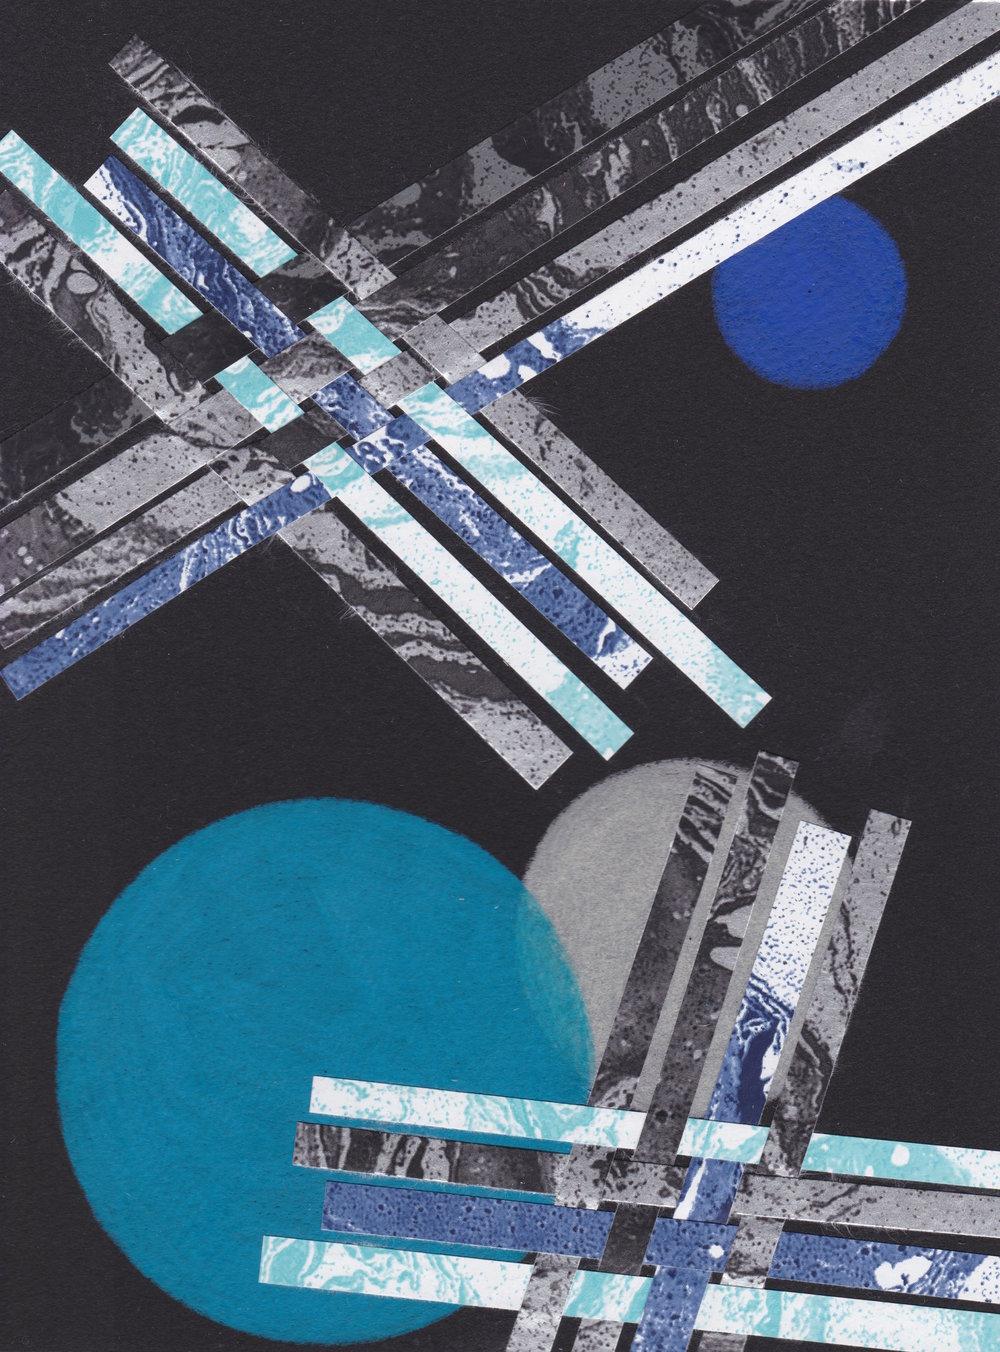 Blue Moons #9